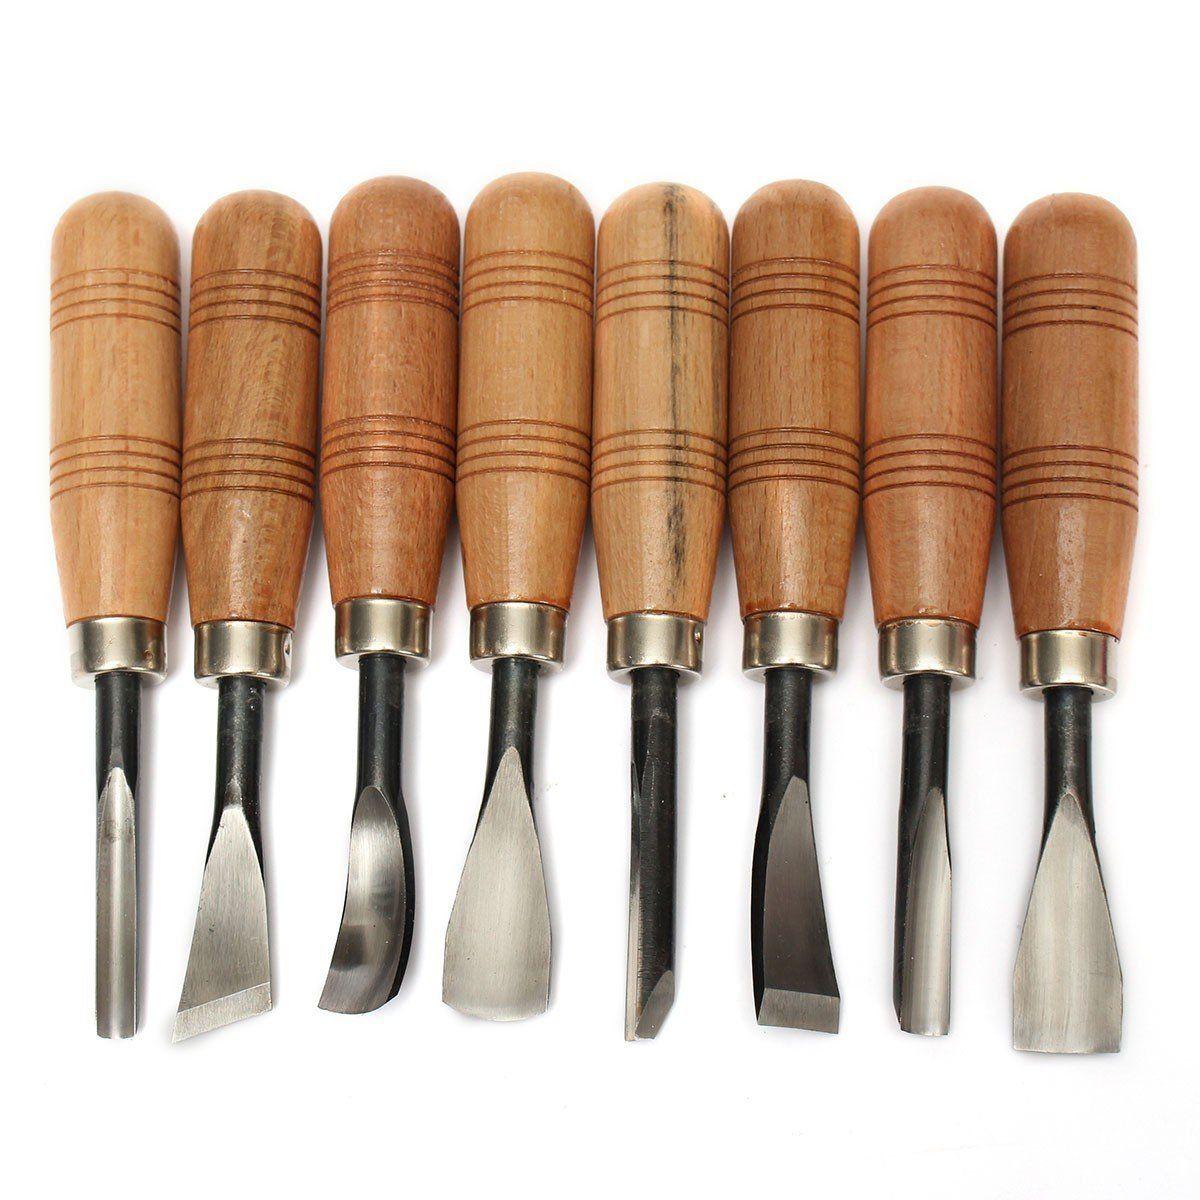 kingso 8pcs wood sculpture carving chisel tool set diy art